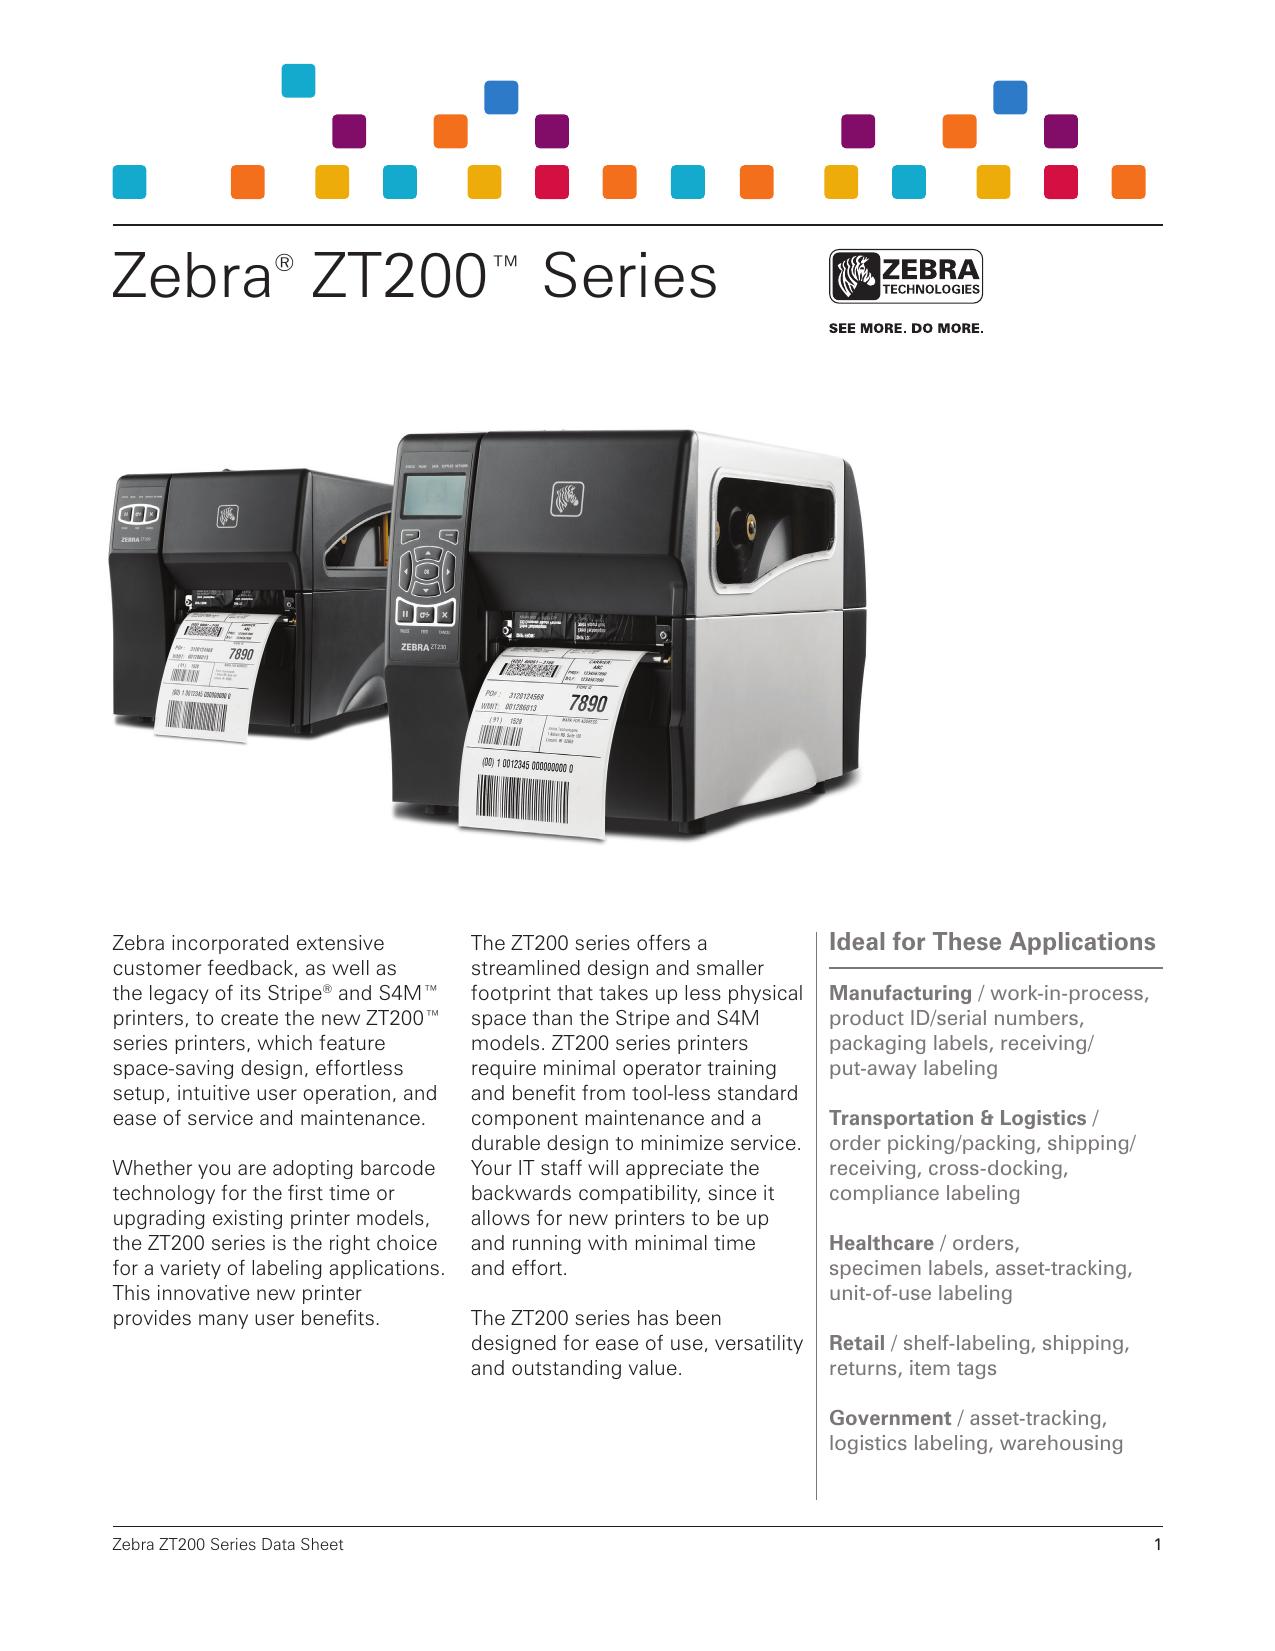 Zebra® ZT200™ Series - ReThink Label Systems   manualzz com